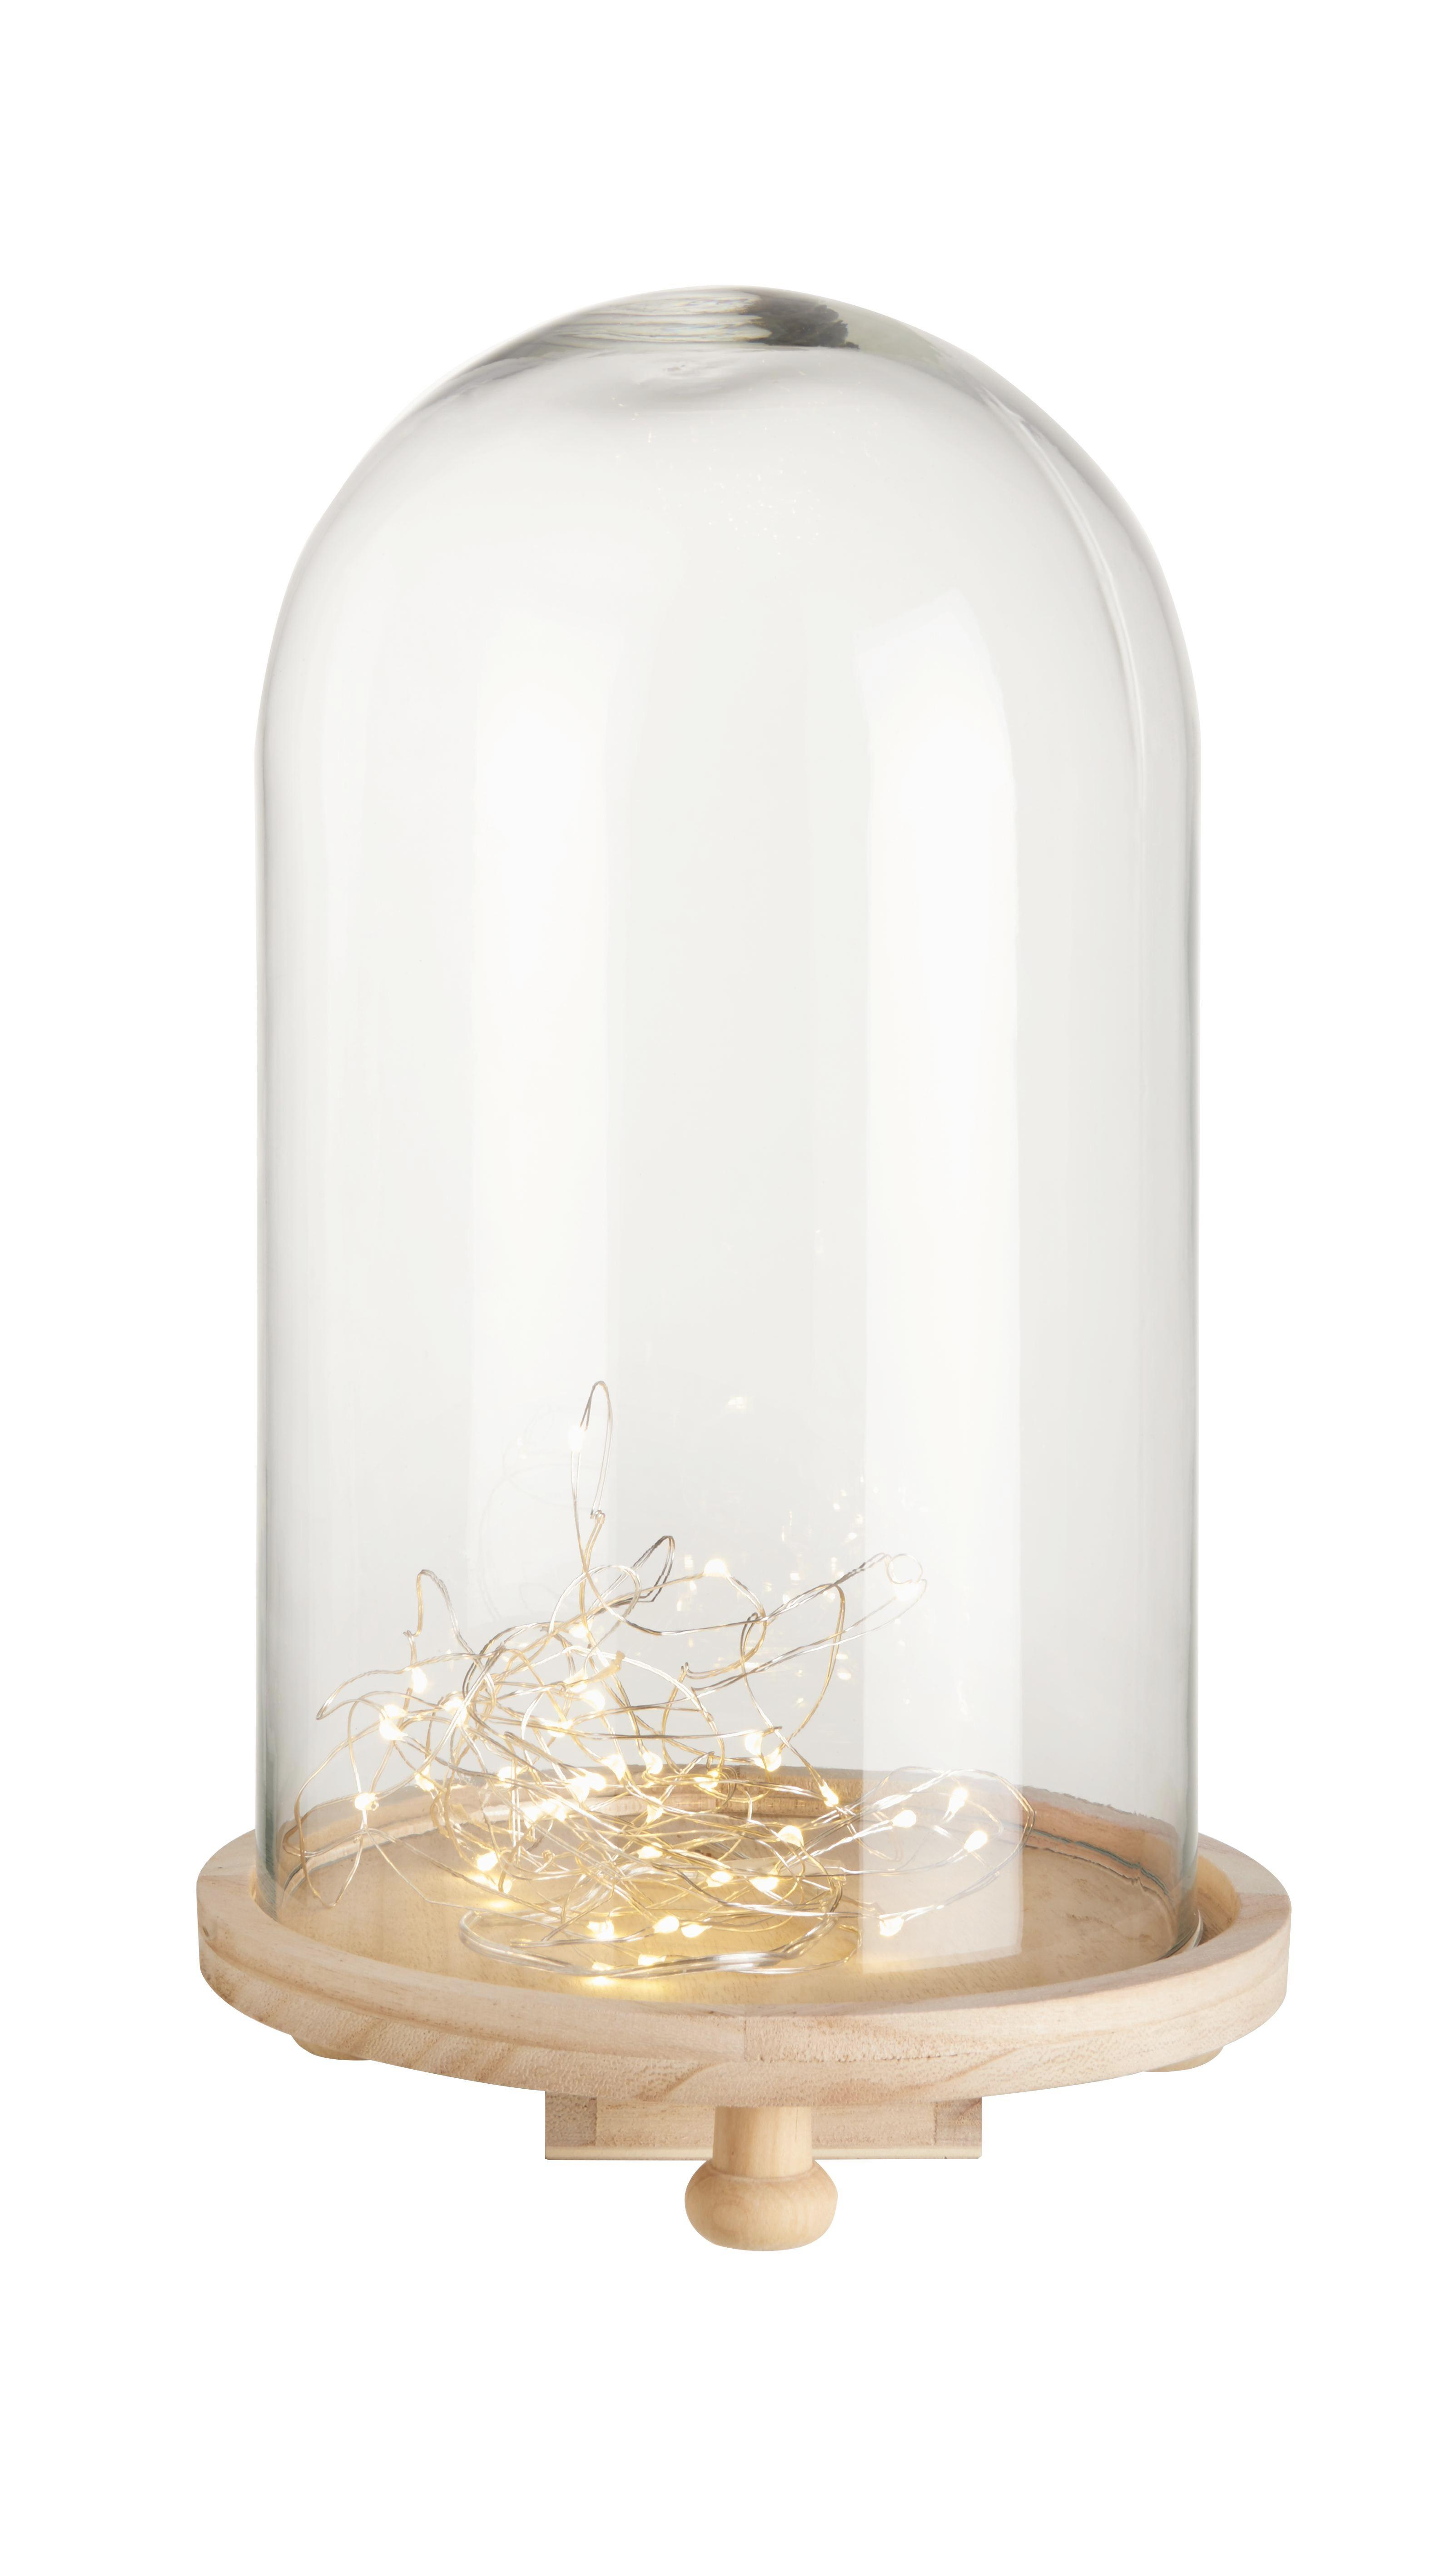 Dekoglocke Gabriele aus Holz und Klarglas - Klar/Naturfarben, Glas/Holz (18,3/30cm) - MÖMAX modern living